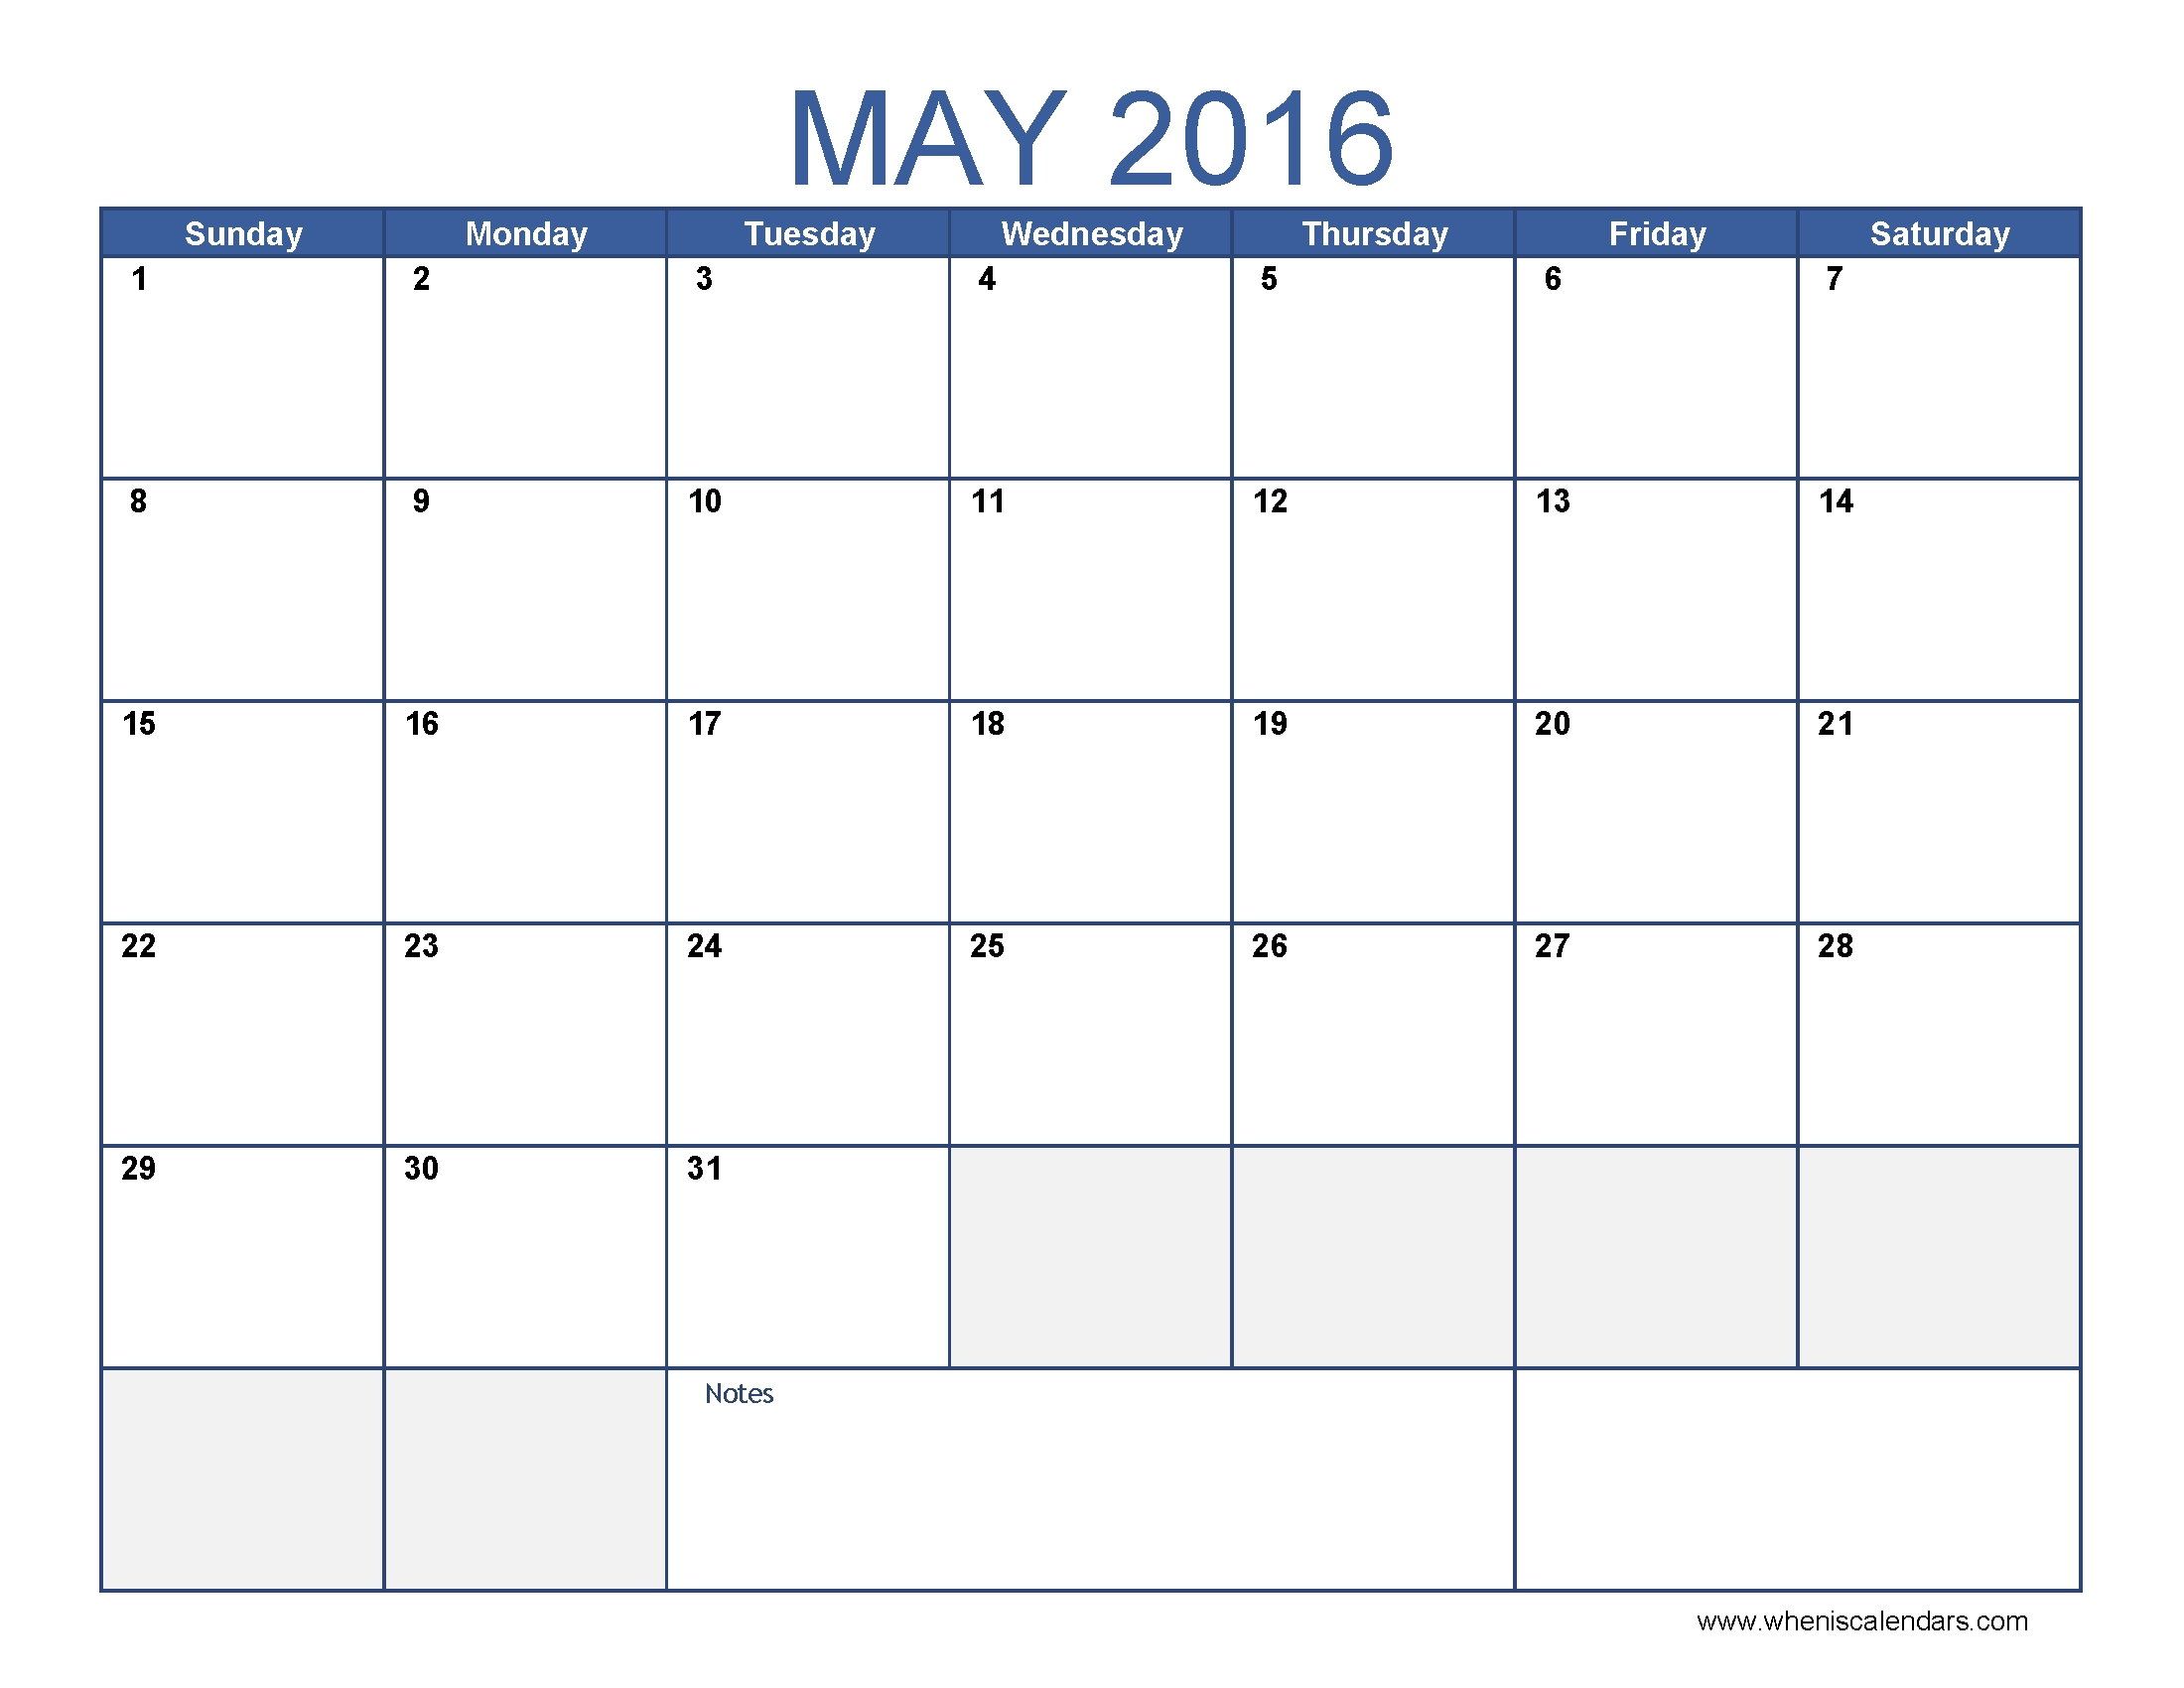 May 2016 Calendar Template Monthly Calendar 2016 Pdf Excel3abry